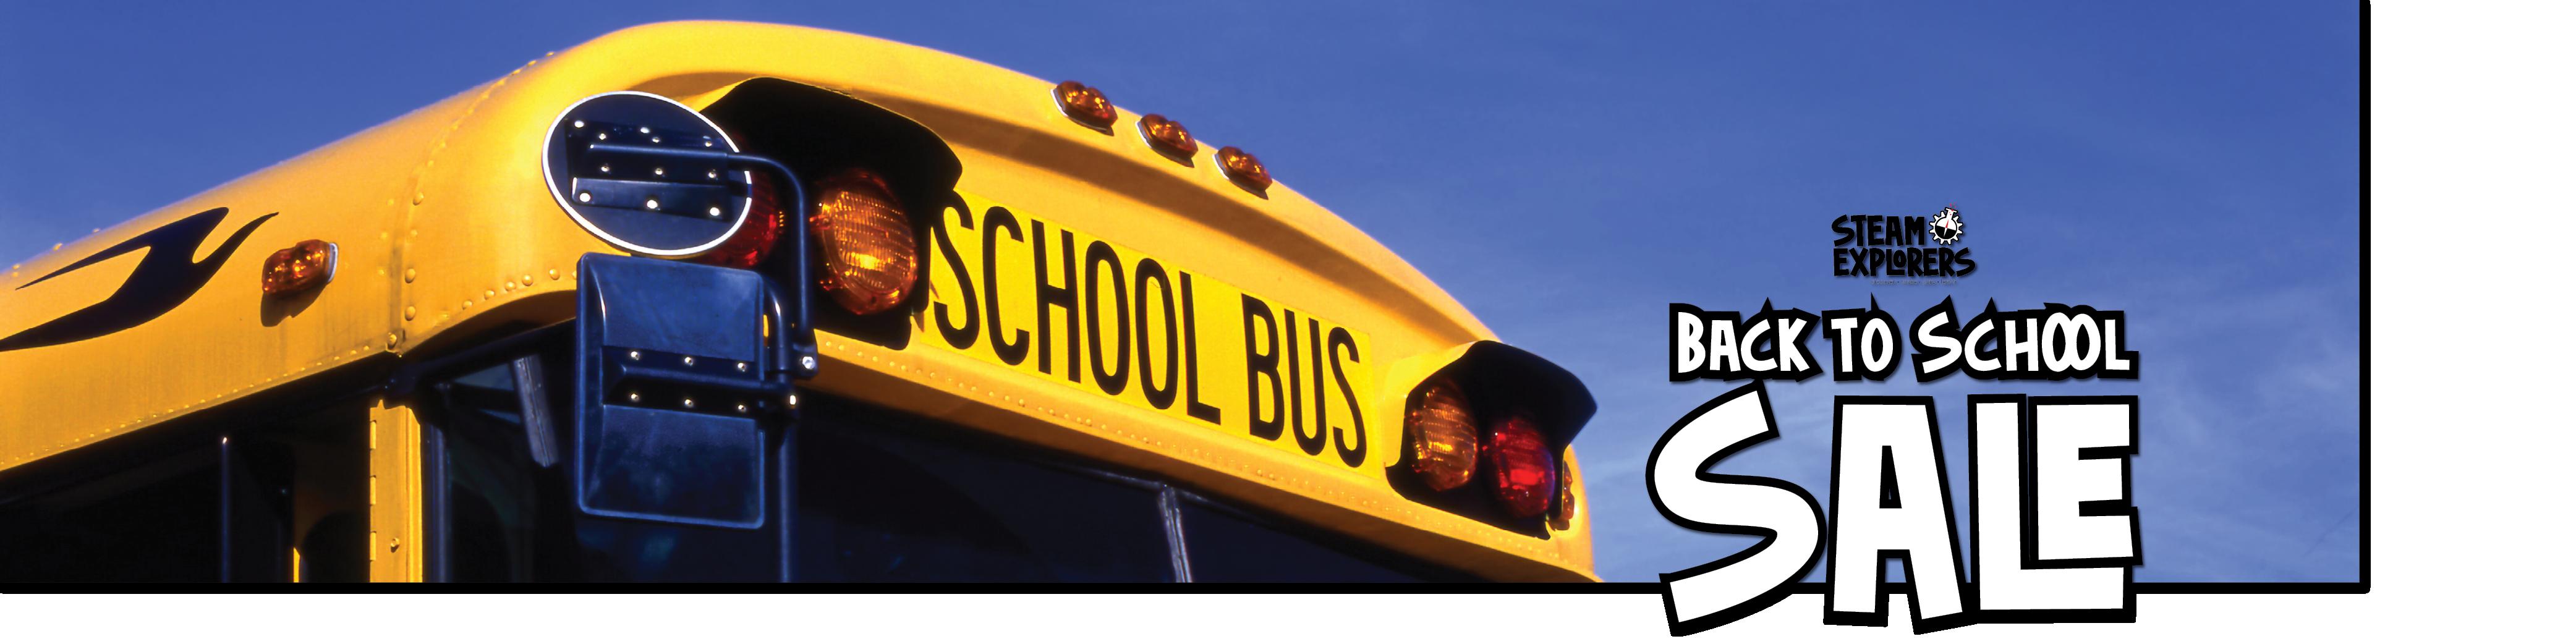 STEAM Explorers Back to School Sale 2000x500 school bus